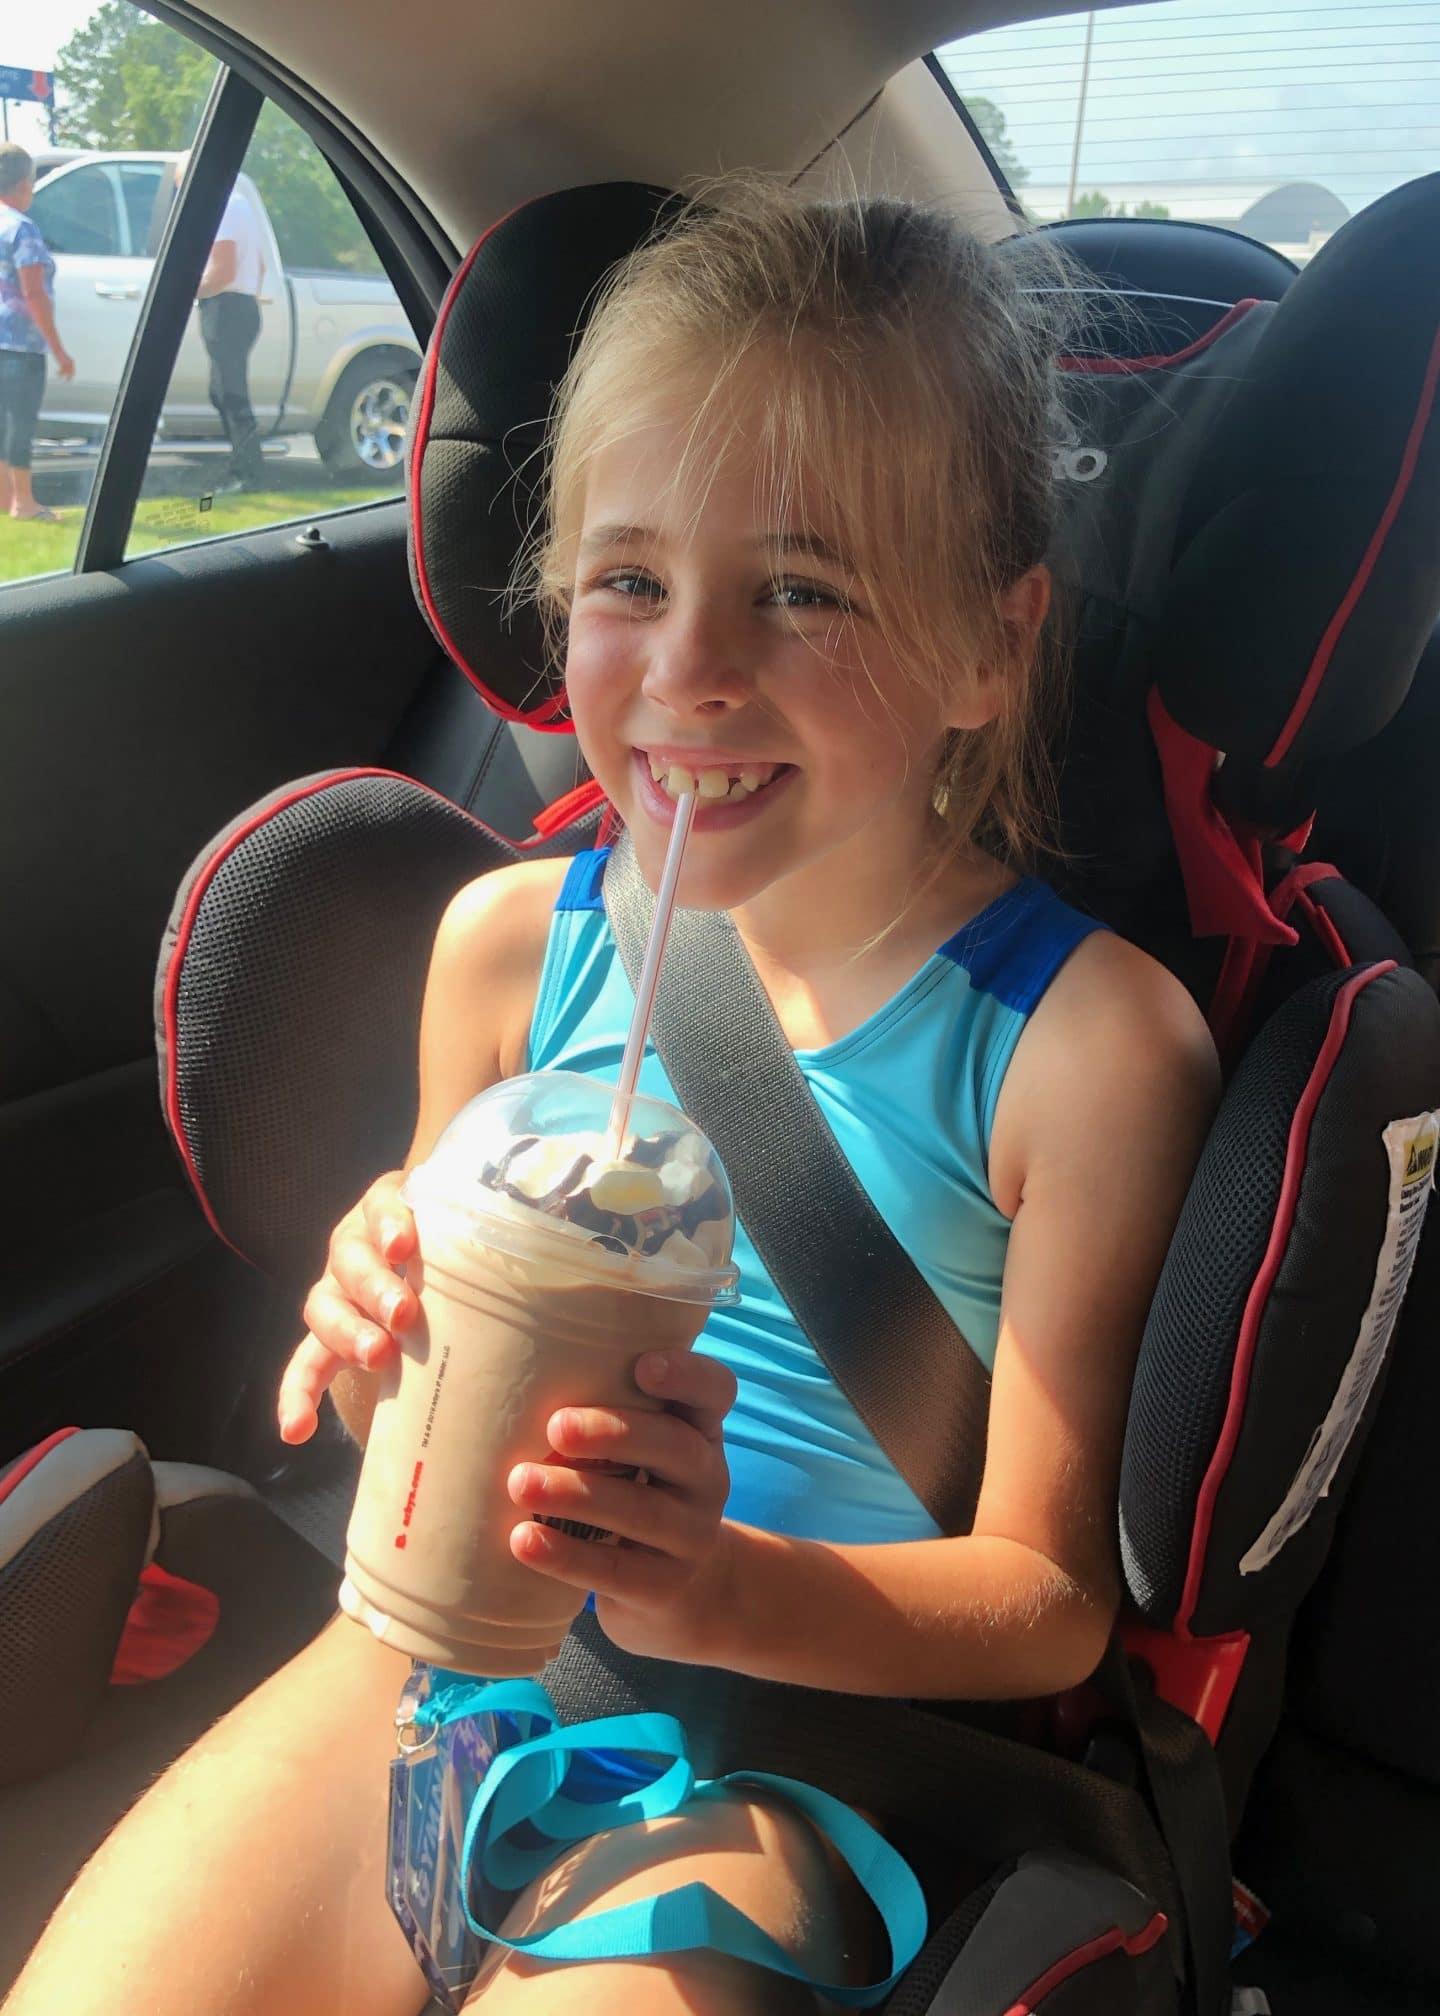 arbys milkshake